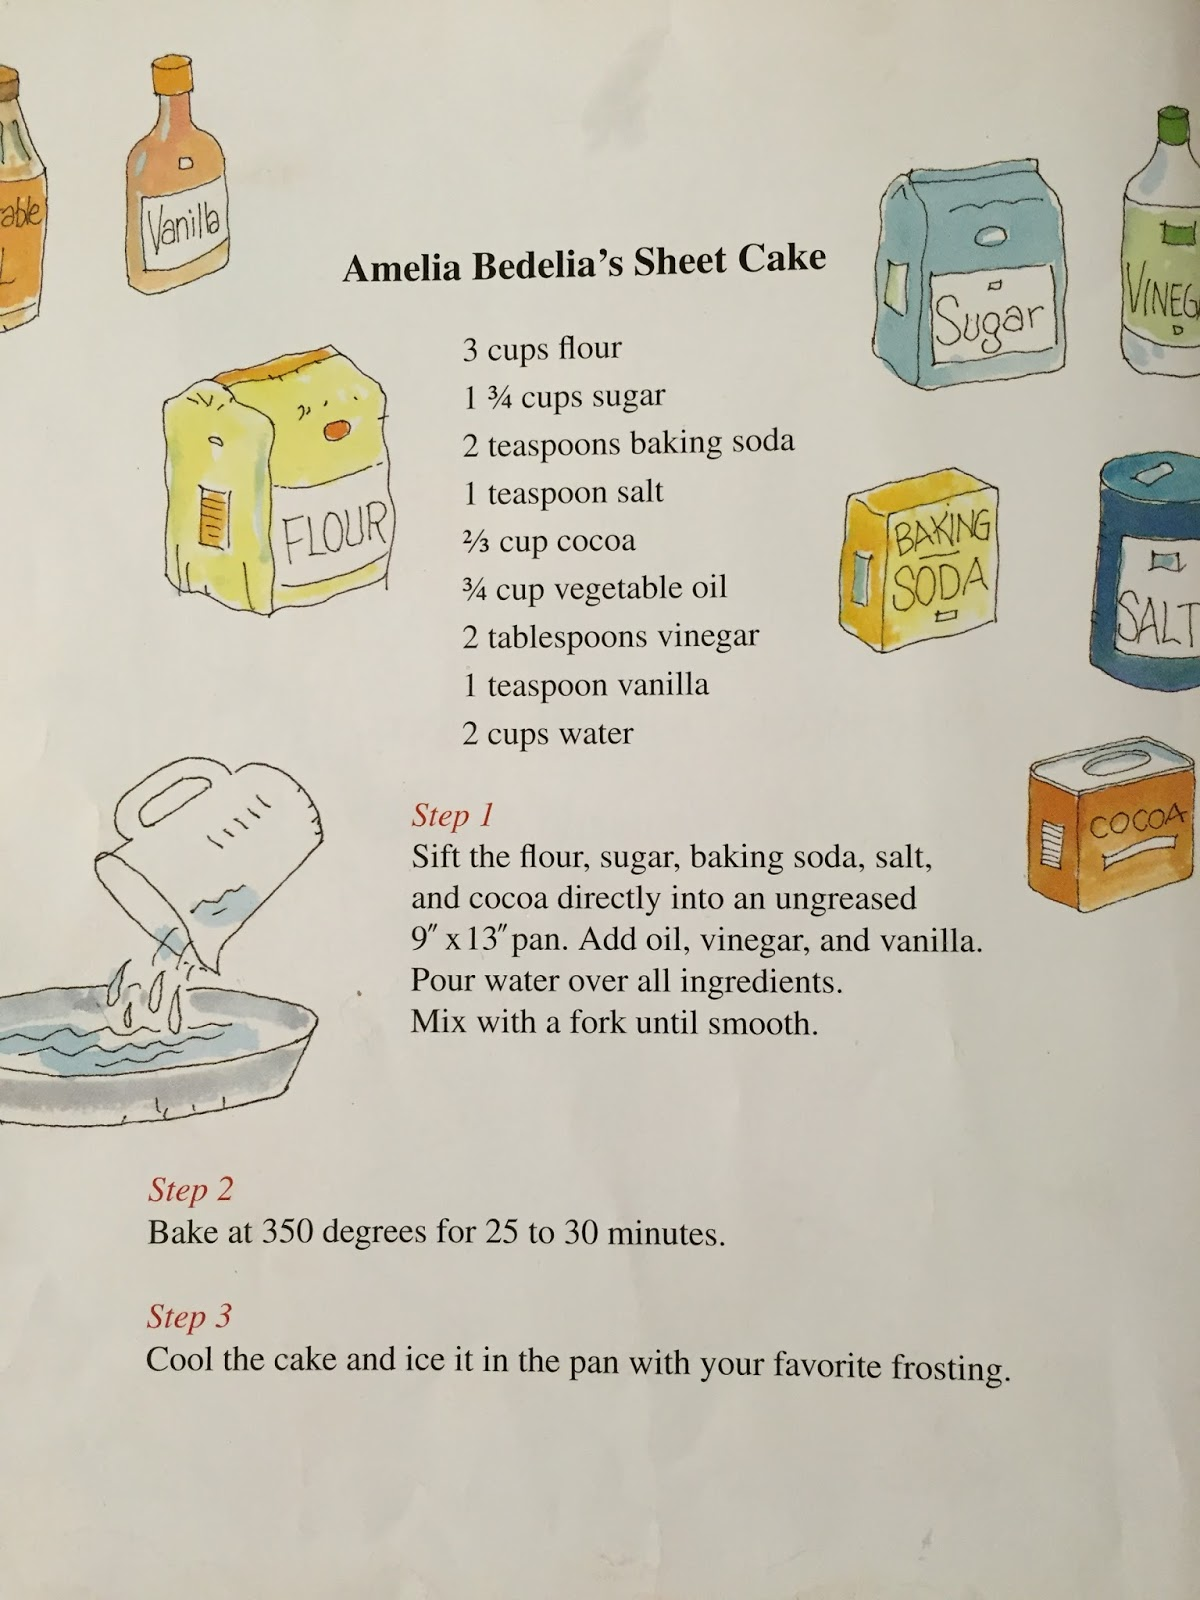 Anderson Mops Tasty Tuesday Amelia Bedelia S Sheet Cake